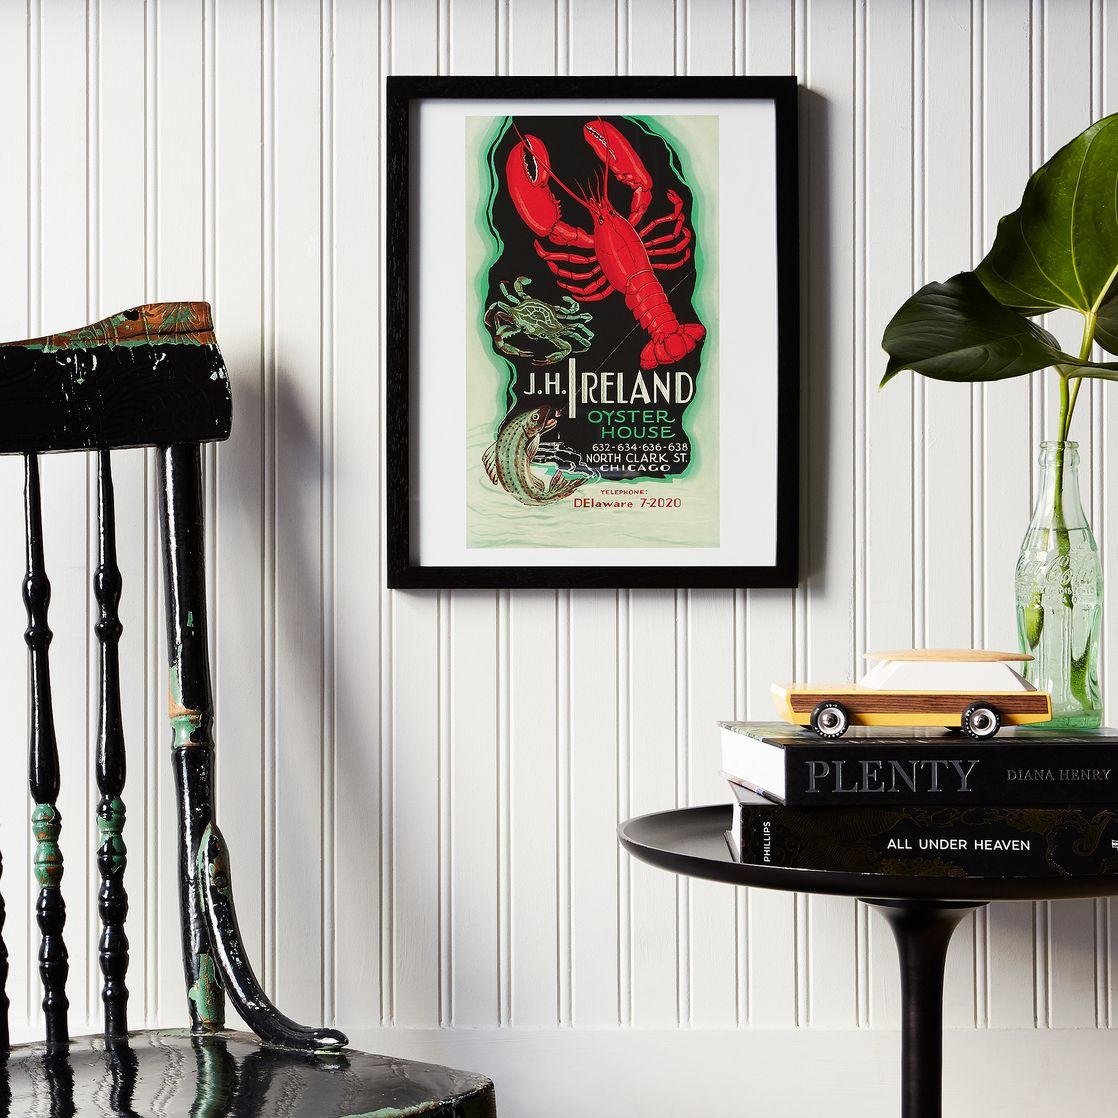 114e0715-e66b-4288-833d-943cdc44f533--2017-0119_love-menu-art_j-h-ireland-oyster-house-print_mid_mark-weinberg_095.jpg